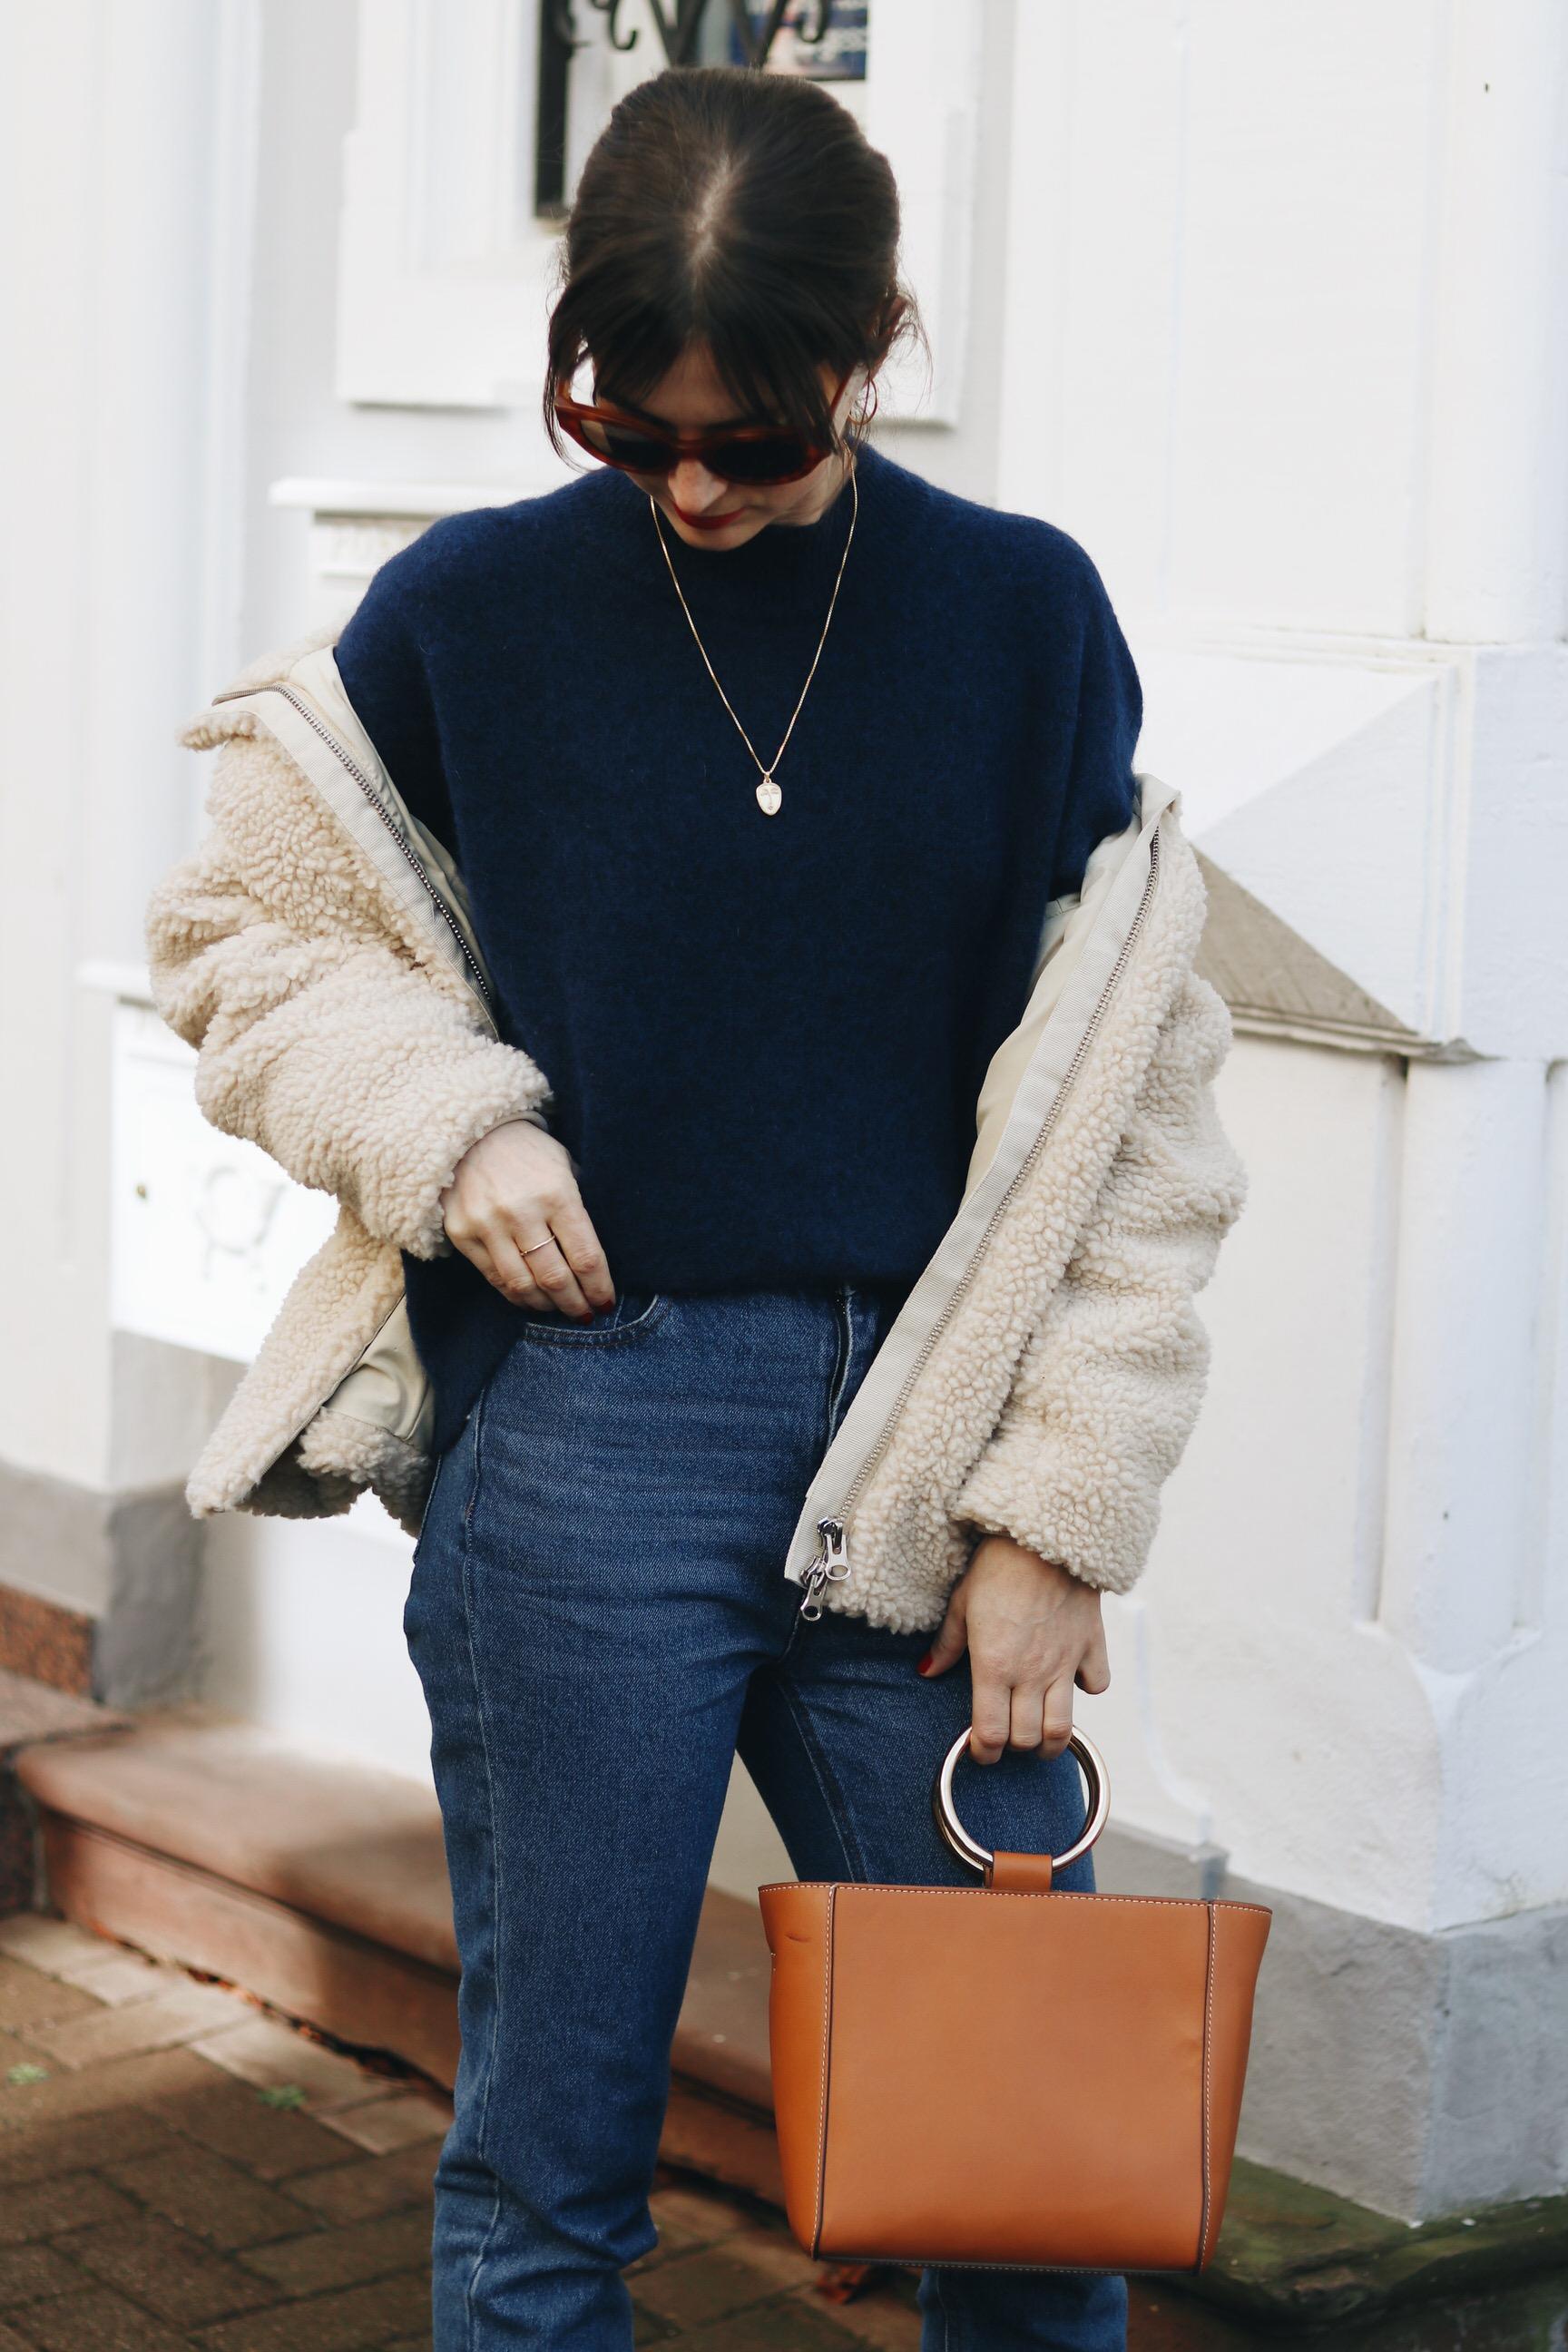 Henkeltasche braun Ring bag Modetrends Taschentrends Outfit Blog Modeblog